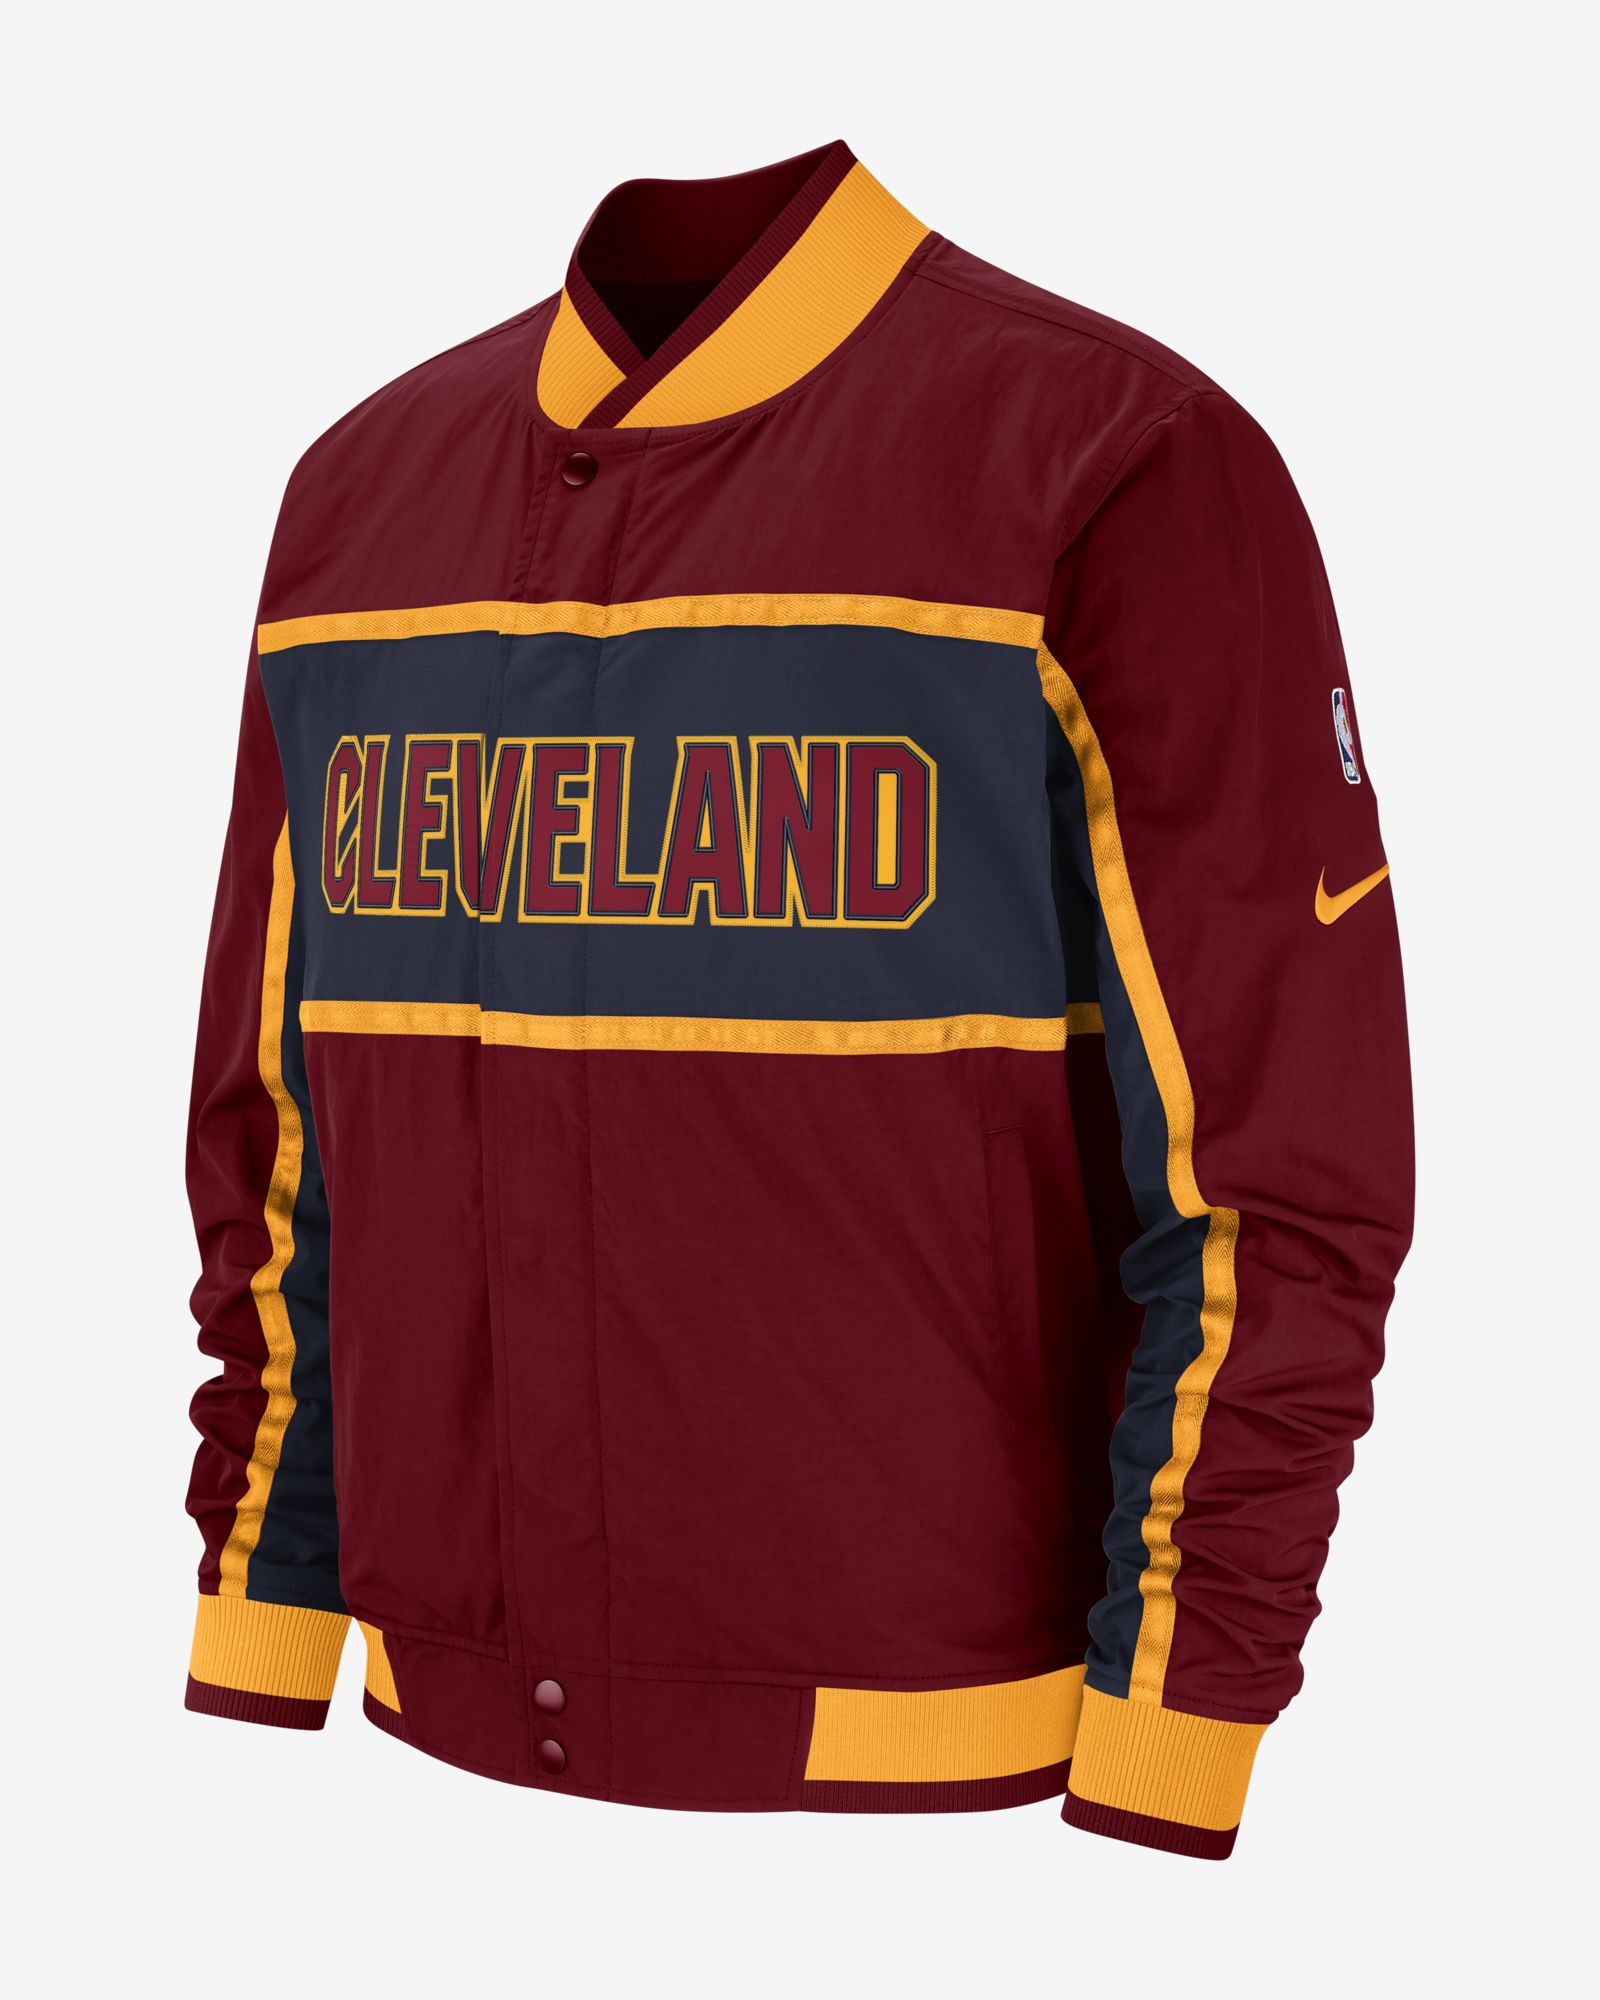 new arrival 2e52b 770d4 Nike NBA Cleveland Cavaliers Courtside Jacket - NBA Shop ...